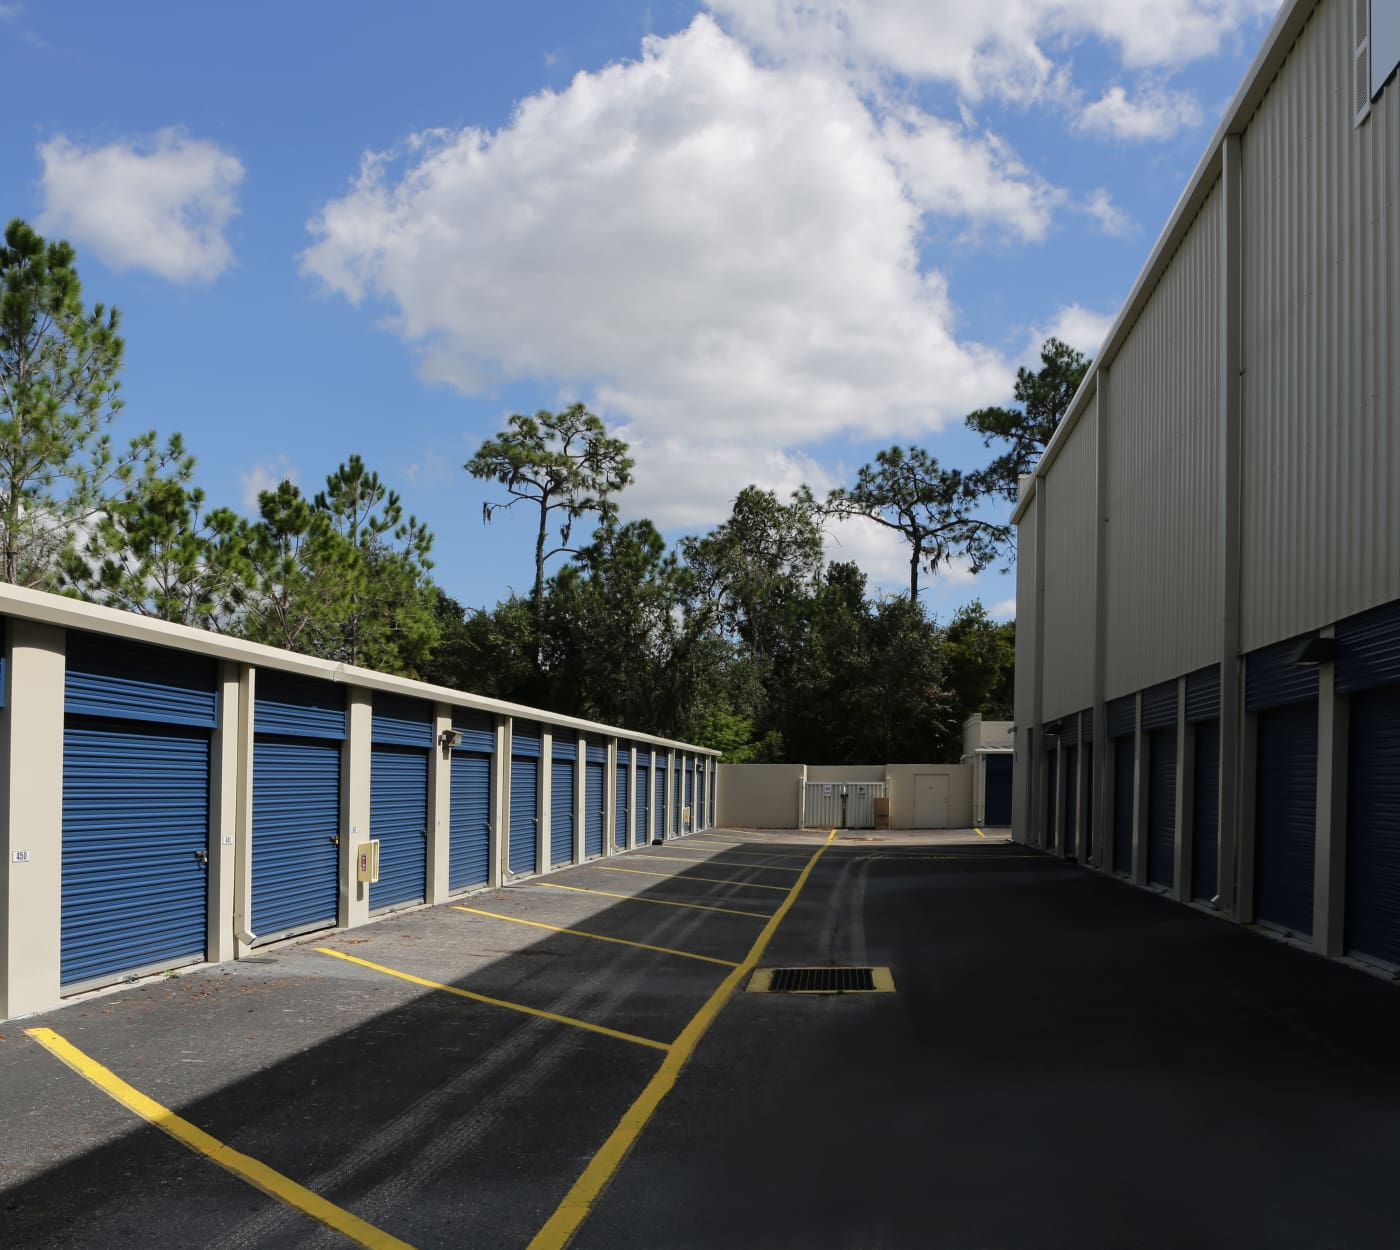 Ground-floor unit at Midgard Self Storage in Bradenton, Florida